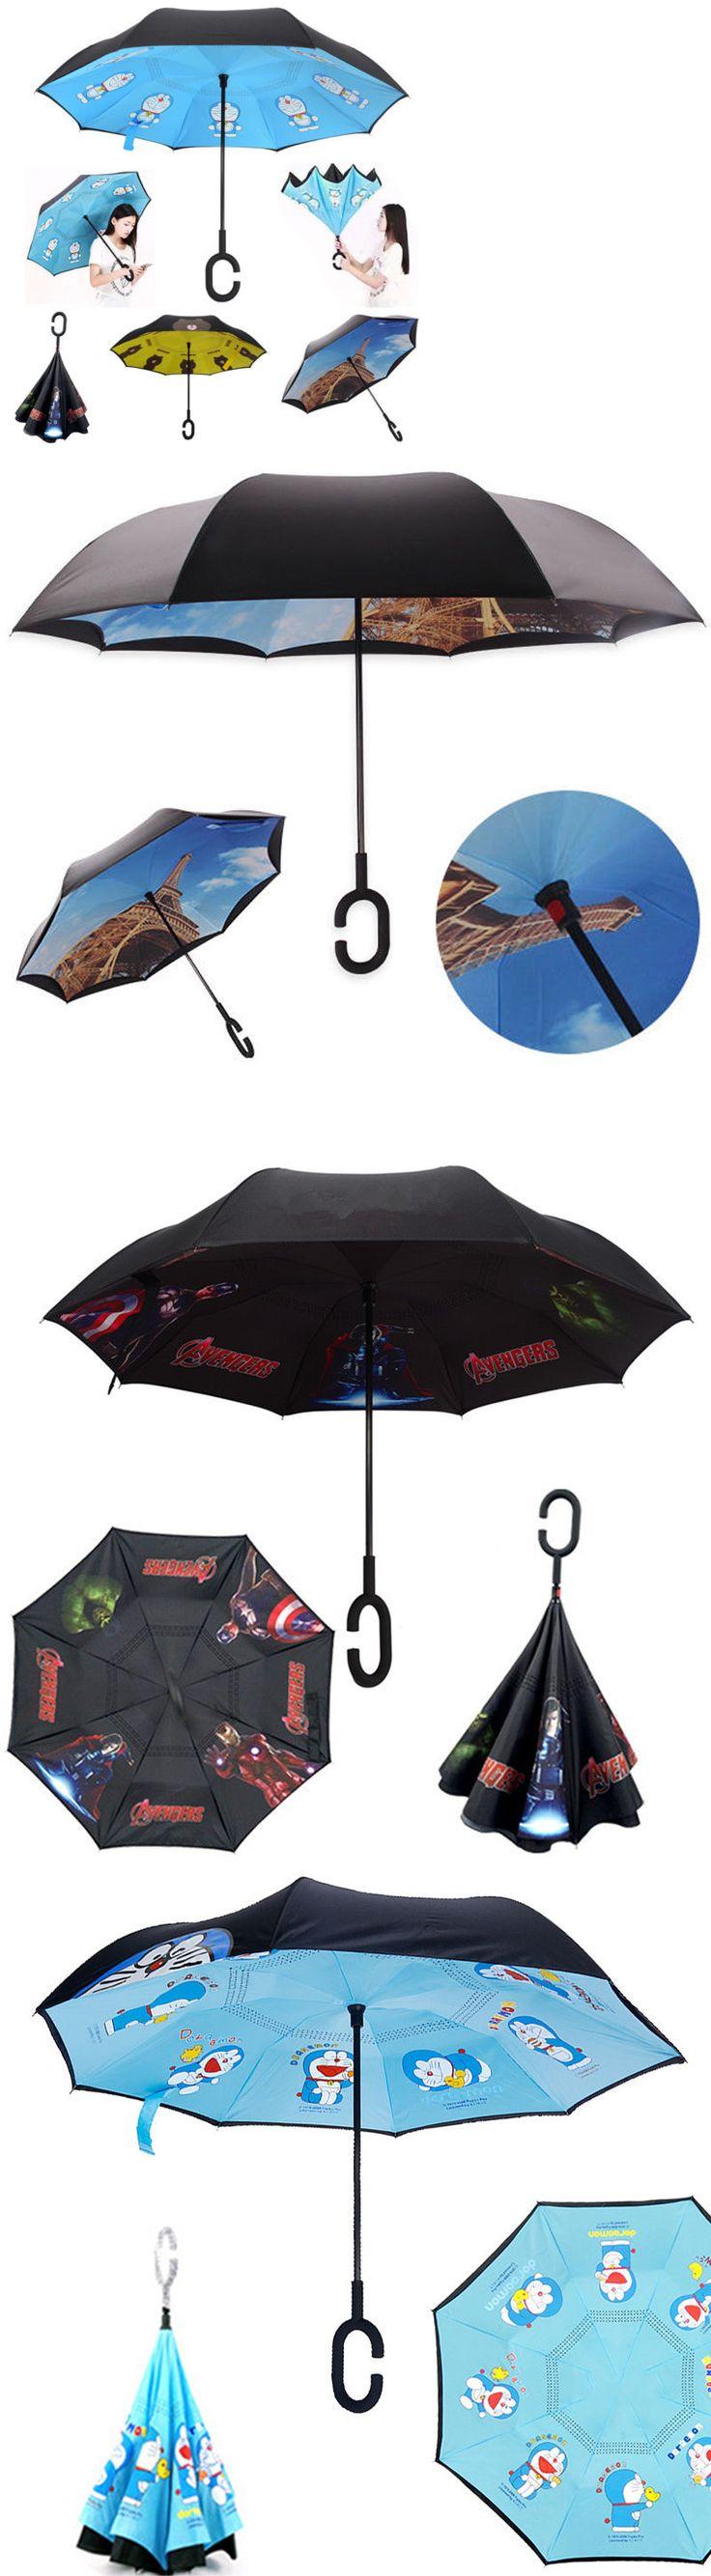 Umbrellas 105569: New Pokemon Go Pikachu C-Handle Car Rain Umbrella Double Layer Inverted Parasols -> BUY IT NOW ONLY: $32.38 on eBay!